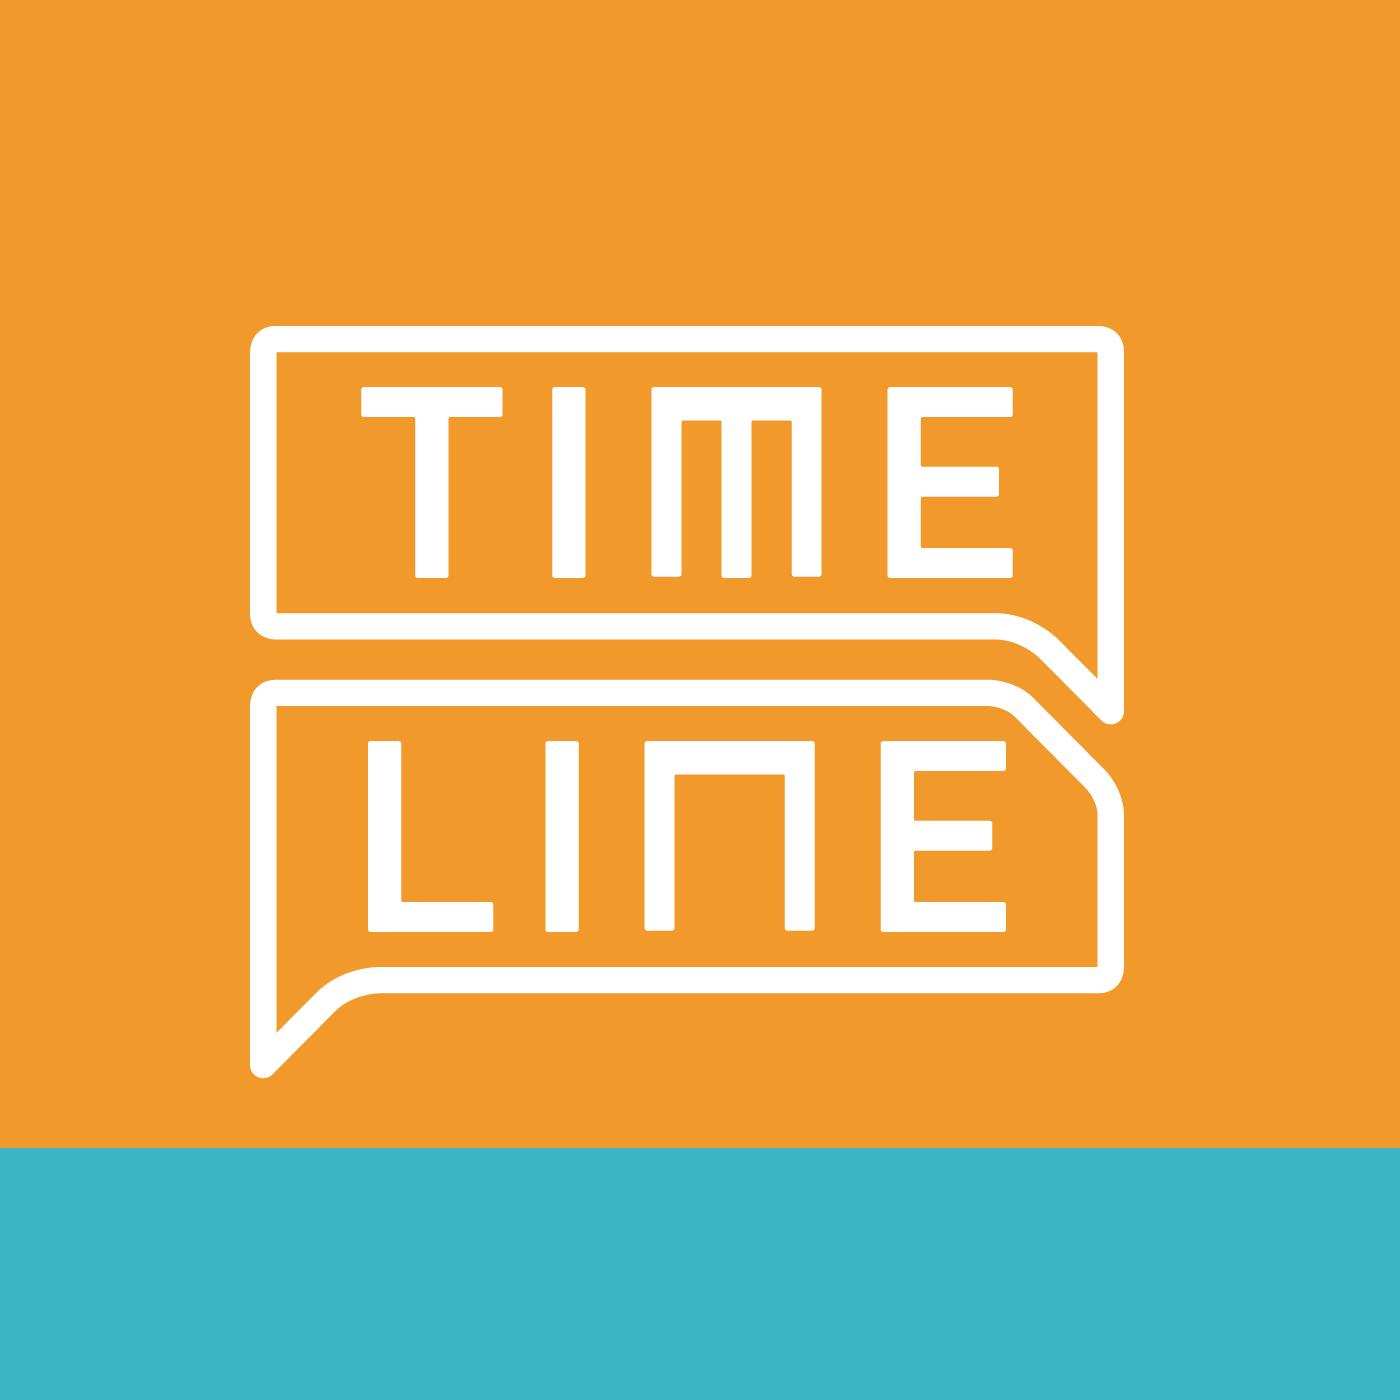 Timeline Gaúcha 13.03.2018